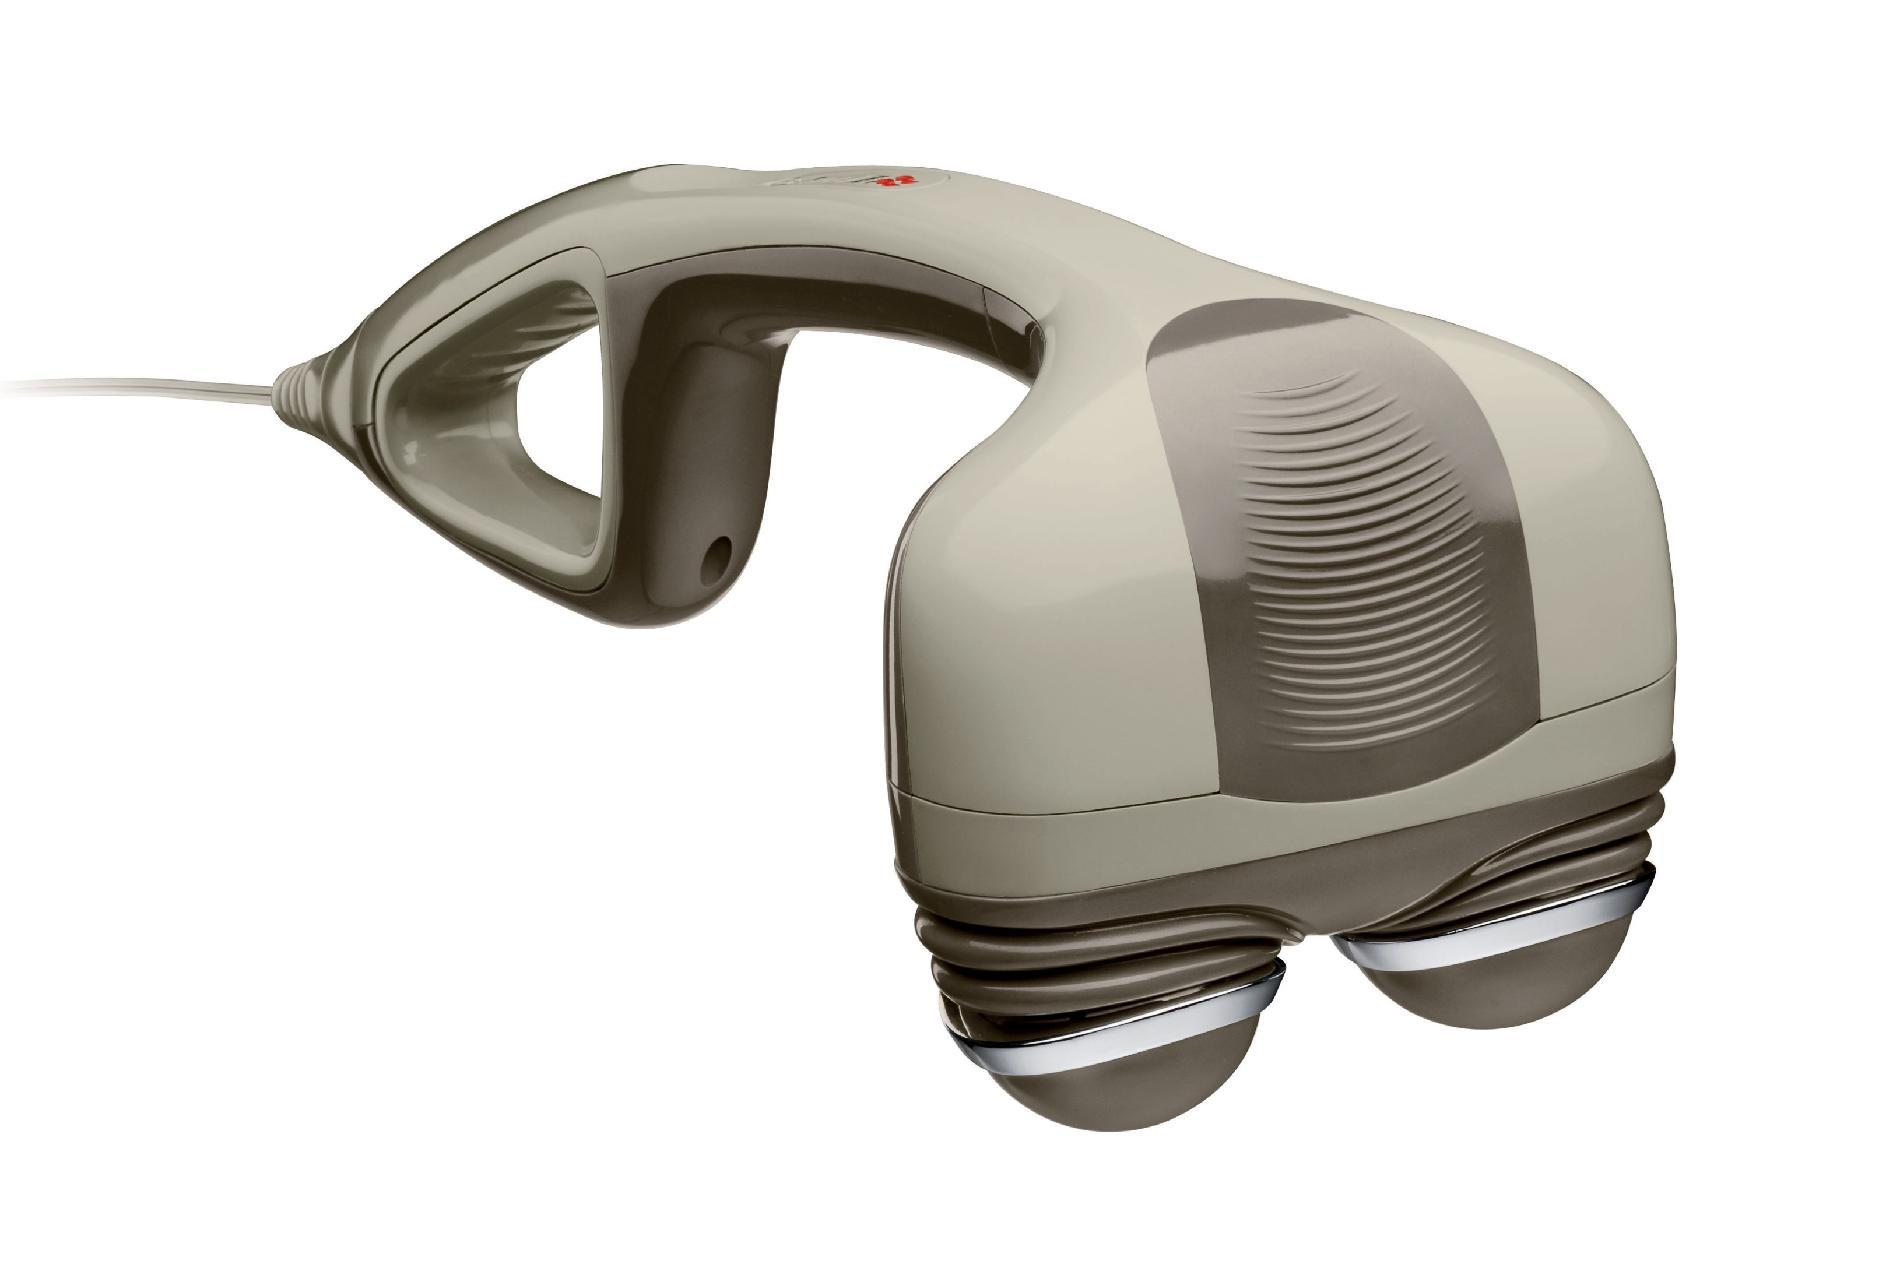 HoMedics Handheld Back Massager